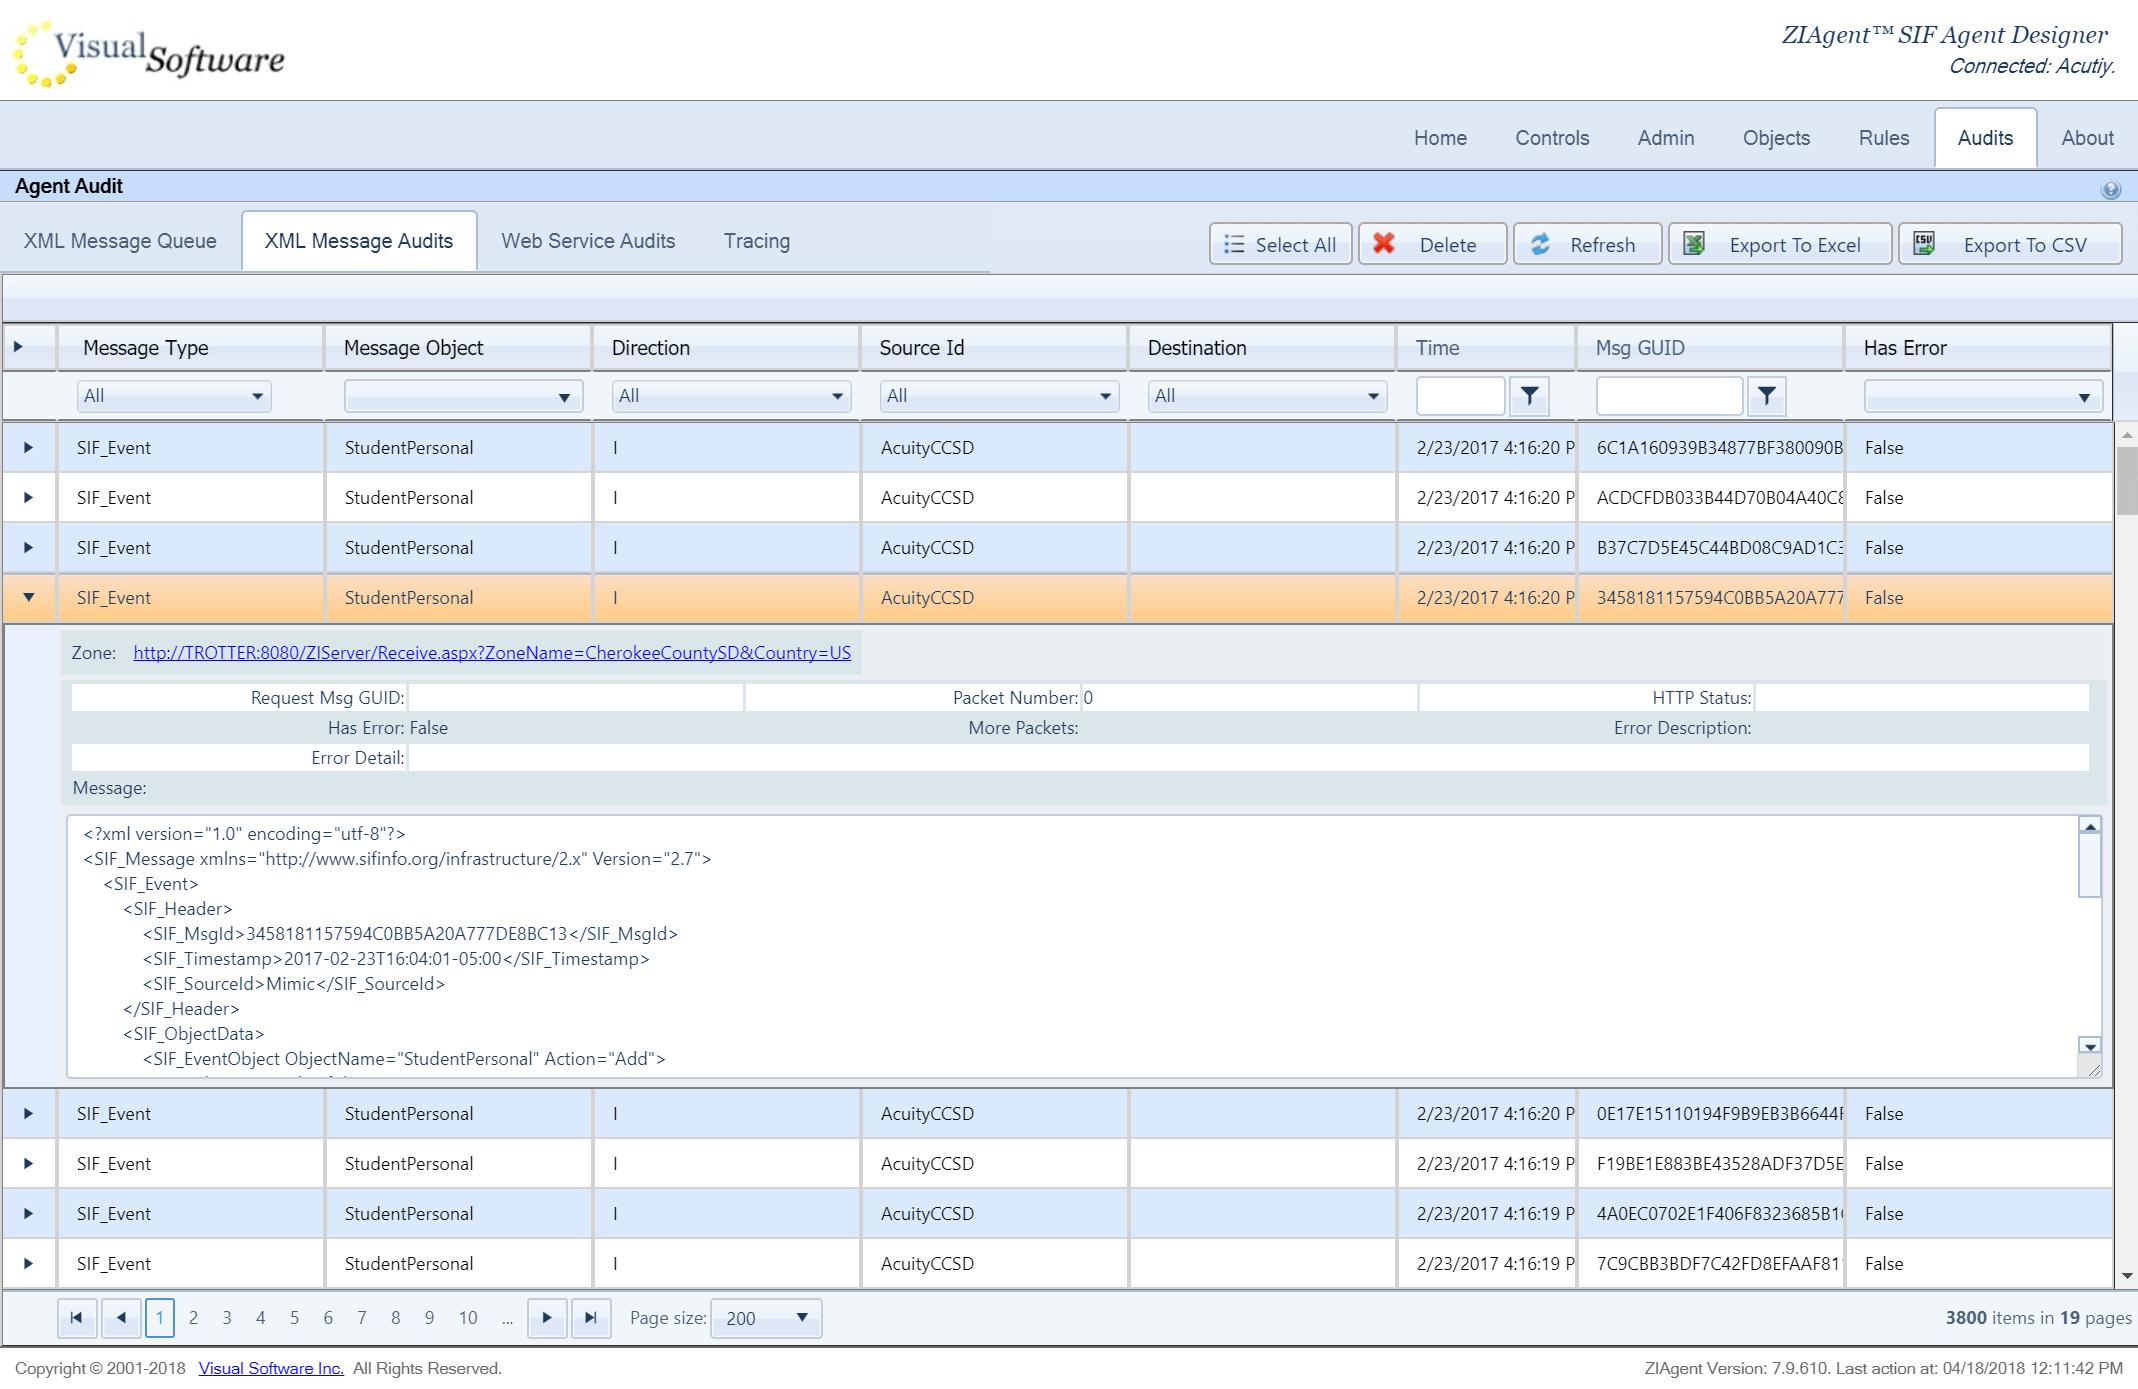 screencapture nacho vsioffice 8082 Designer Audits aspx 2018 04 18 12 11 44 - ZIAgent - Configurable Application Adapter